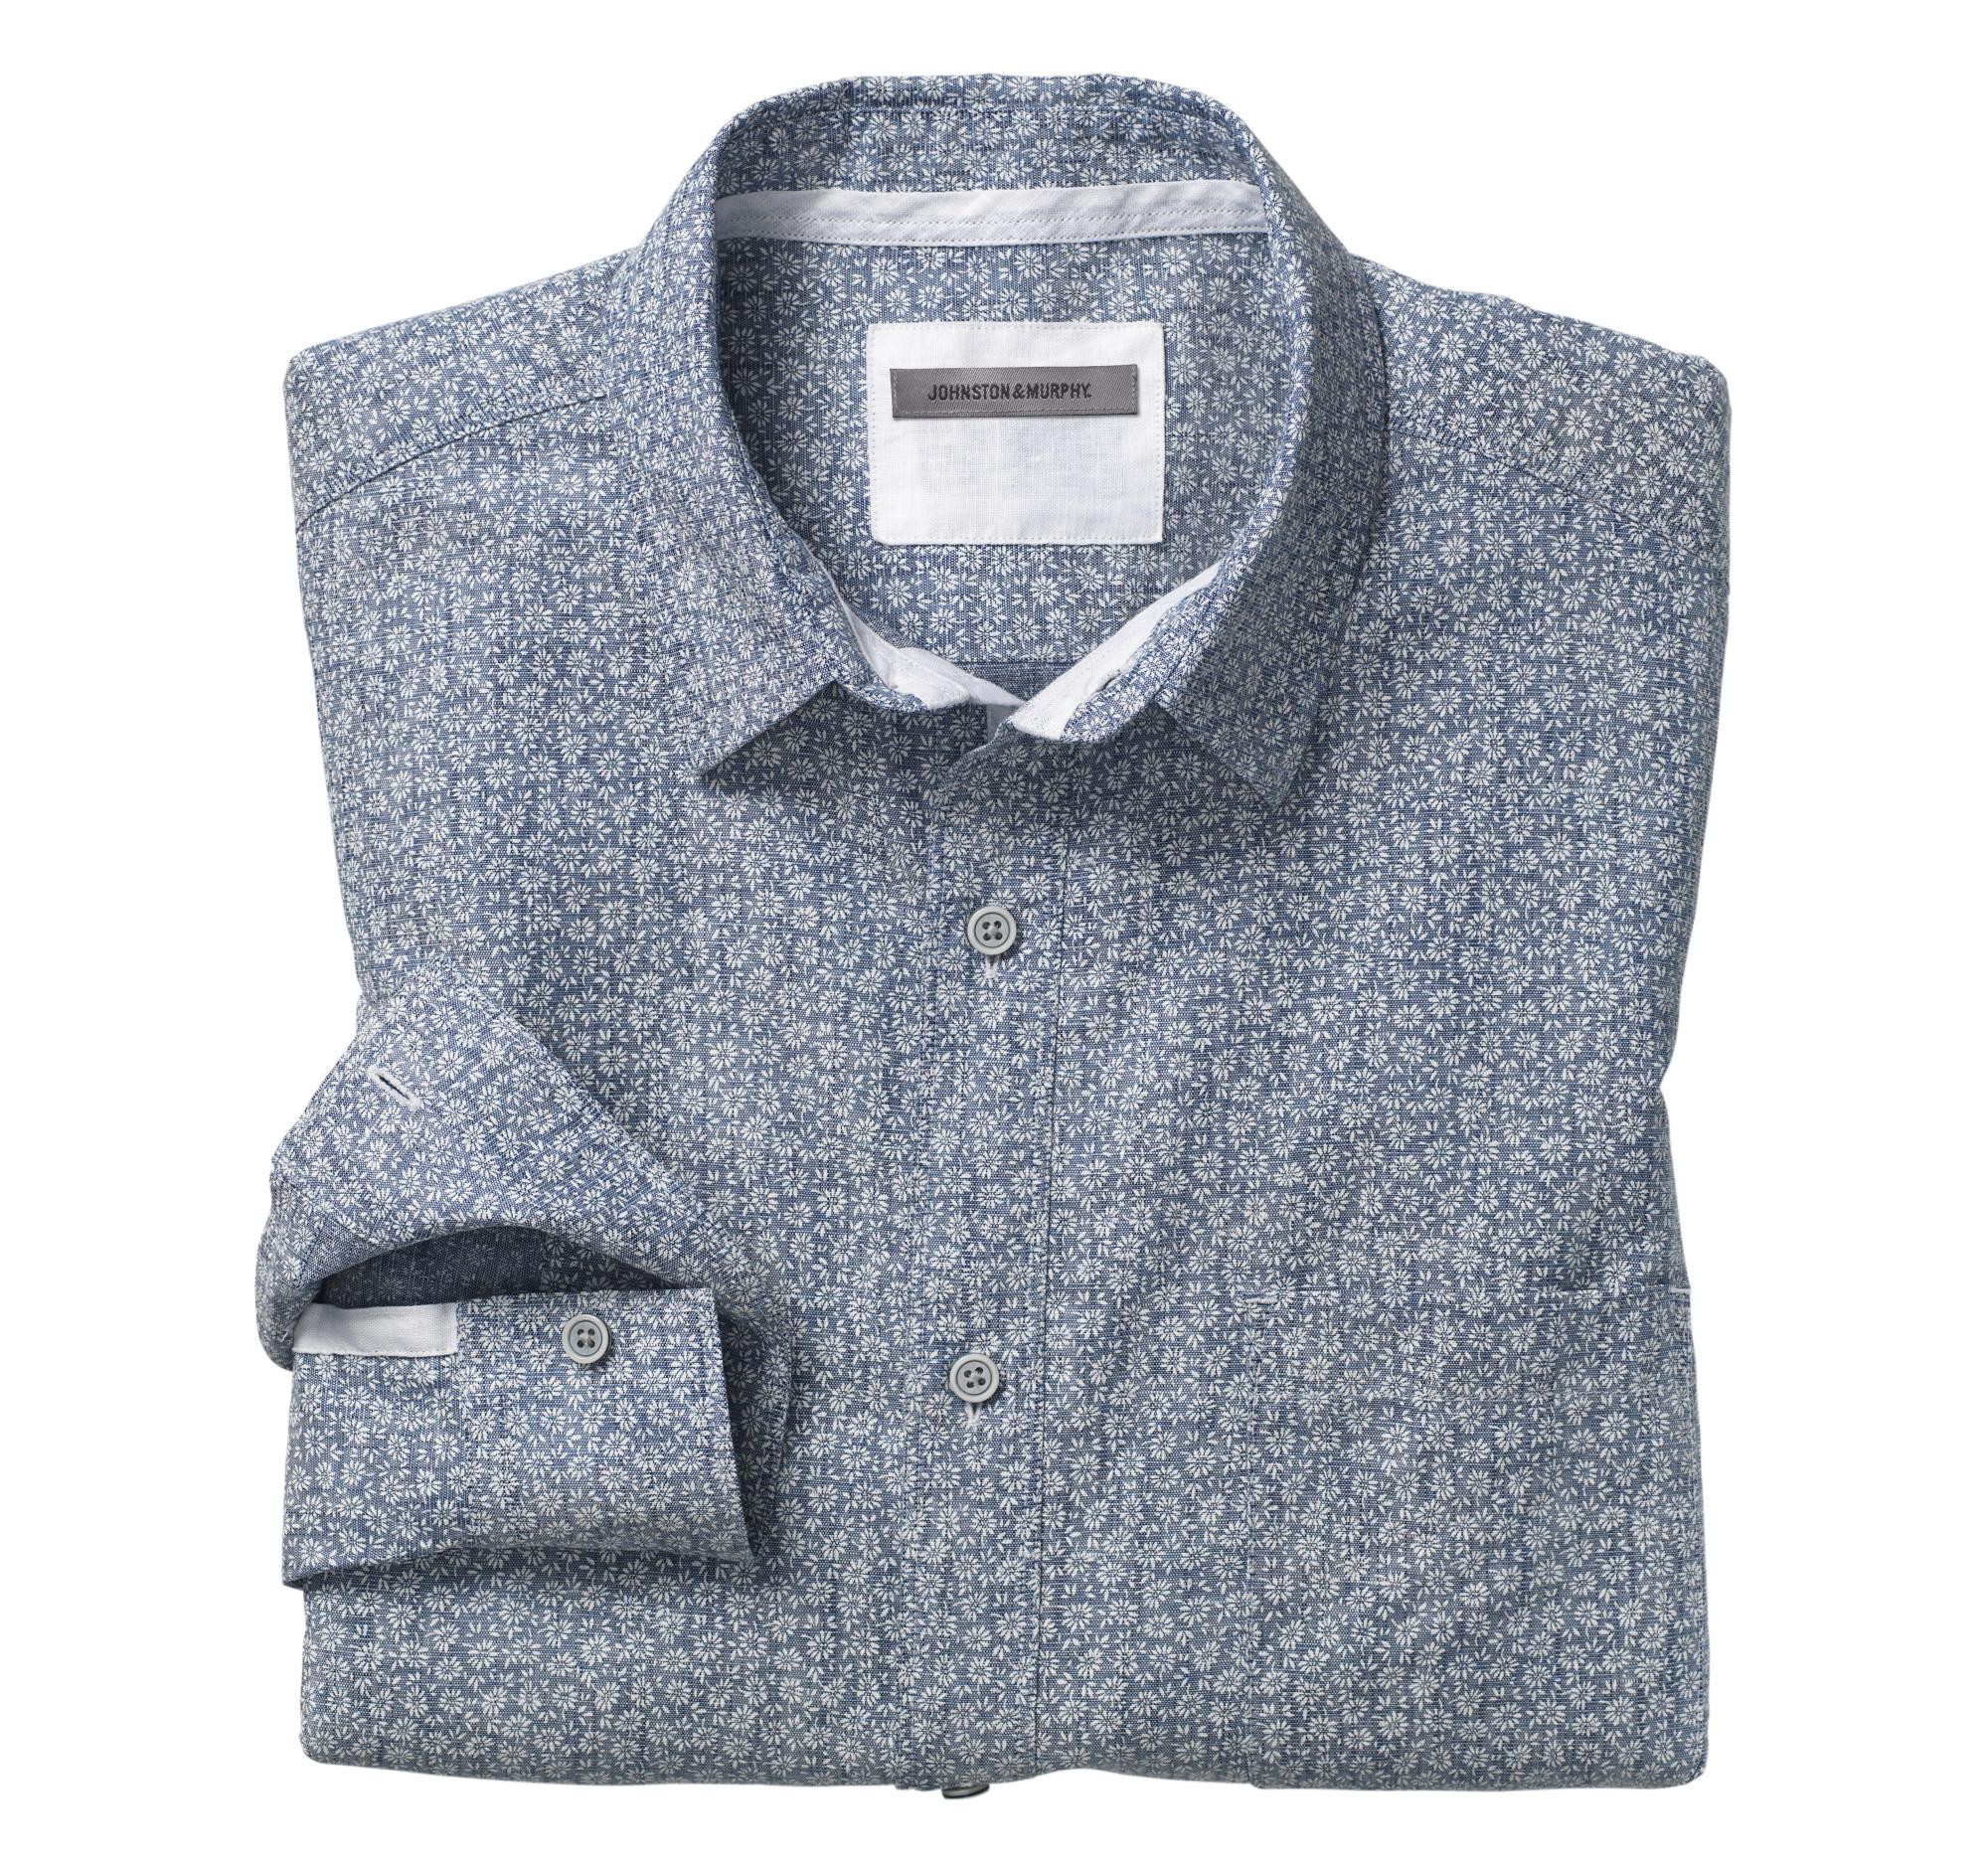 Washed Linen Shirt Johnston Amp Murphy